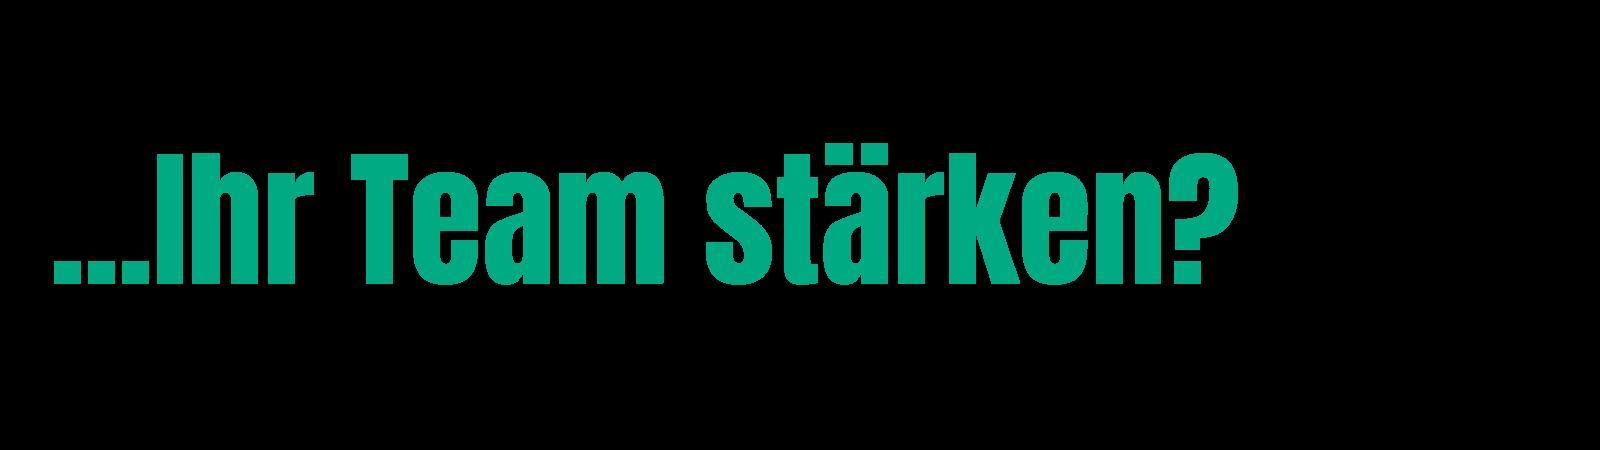 teamspirit-slider-low-green.png